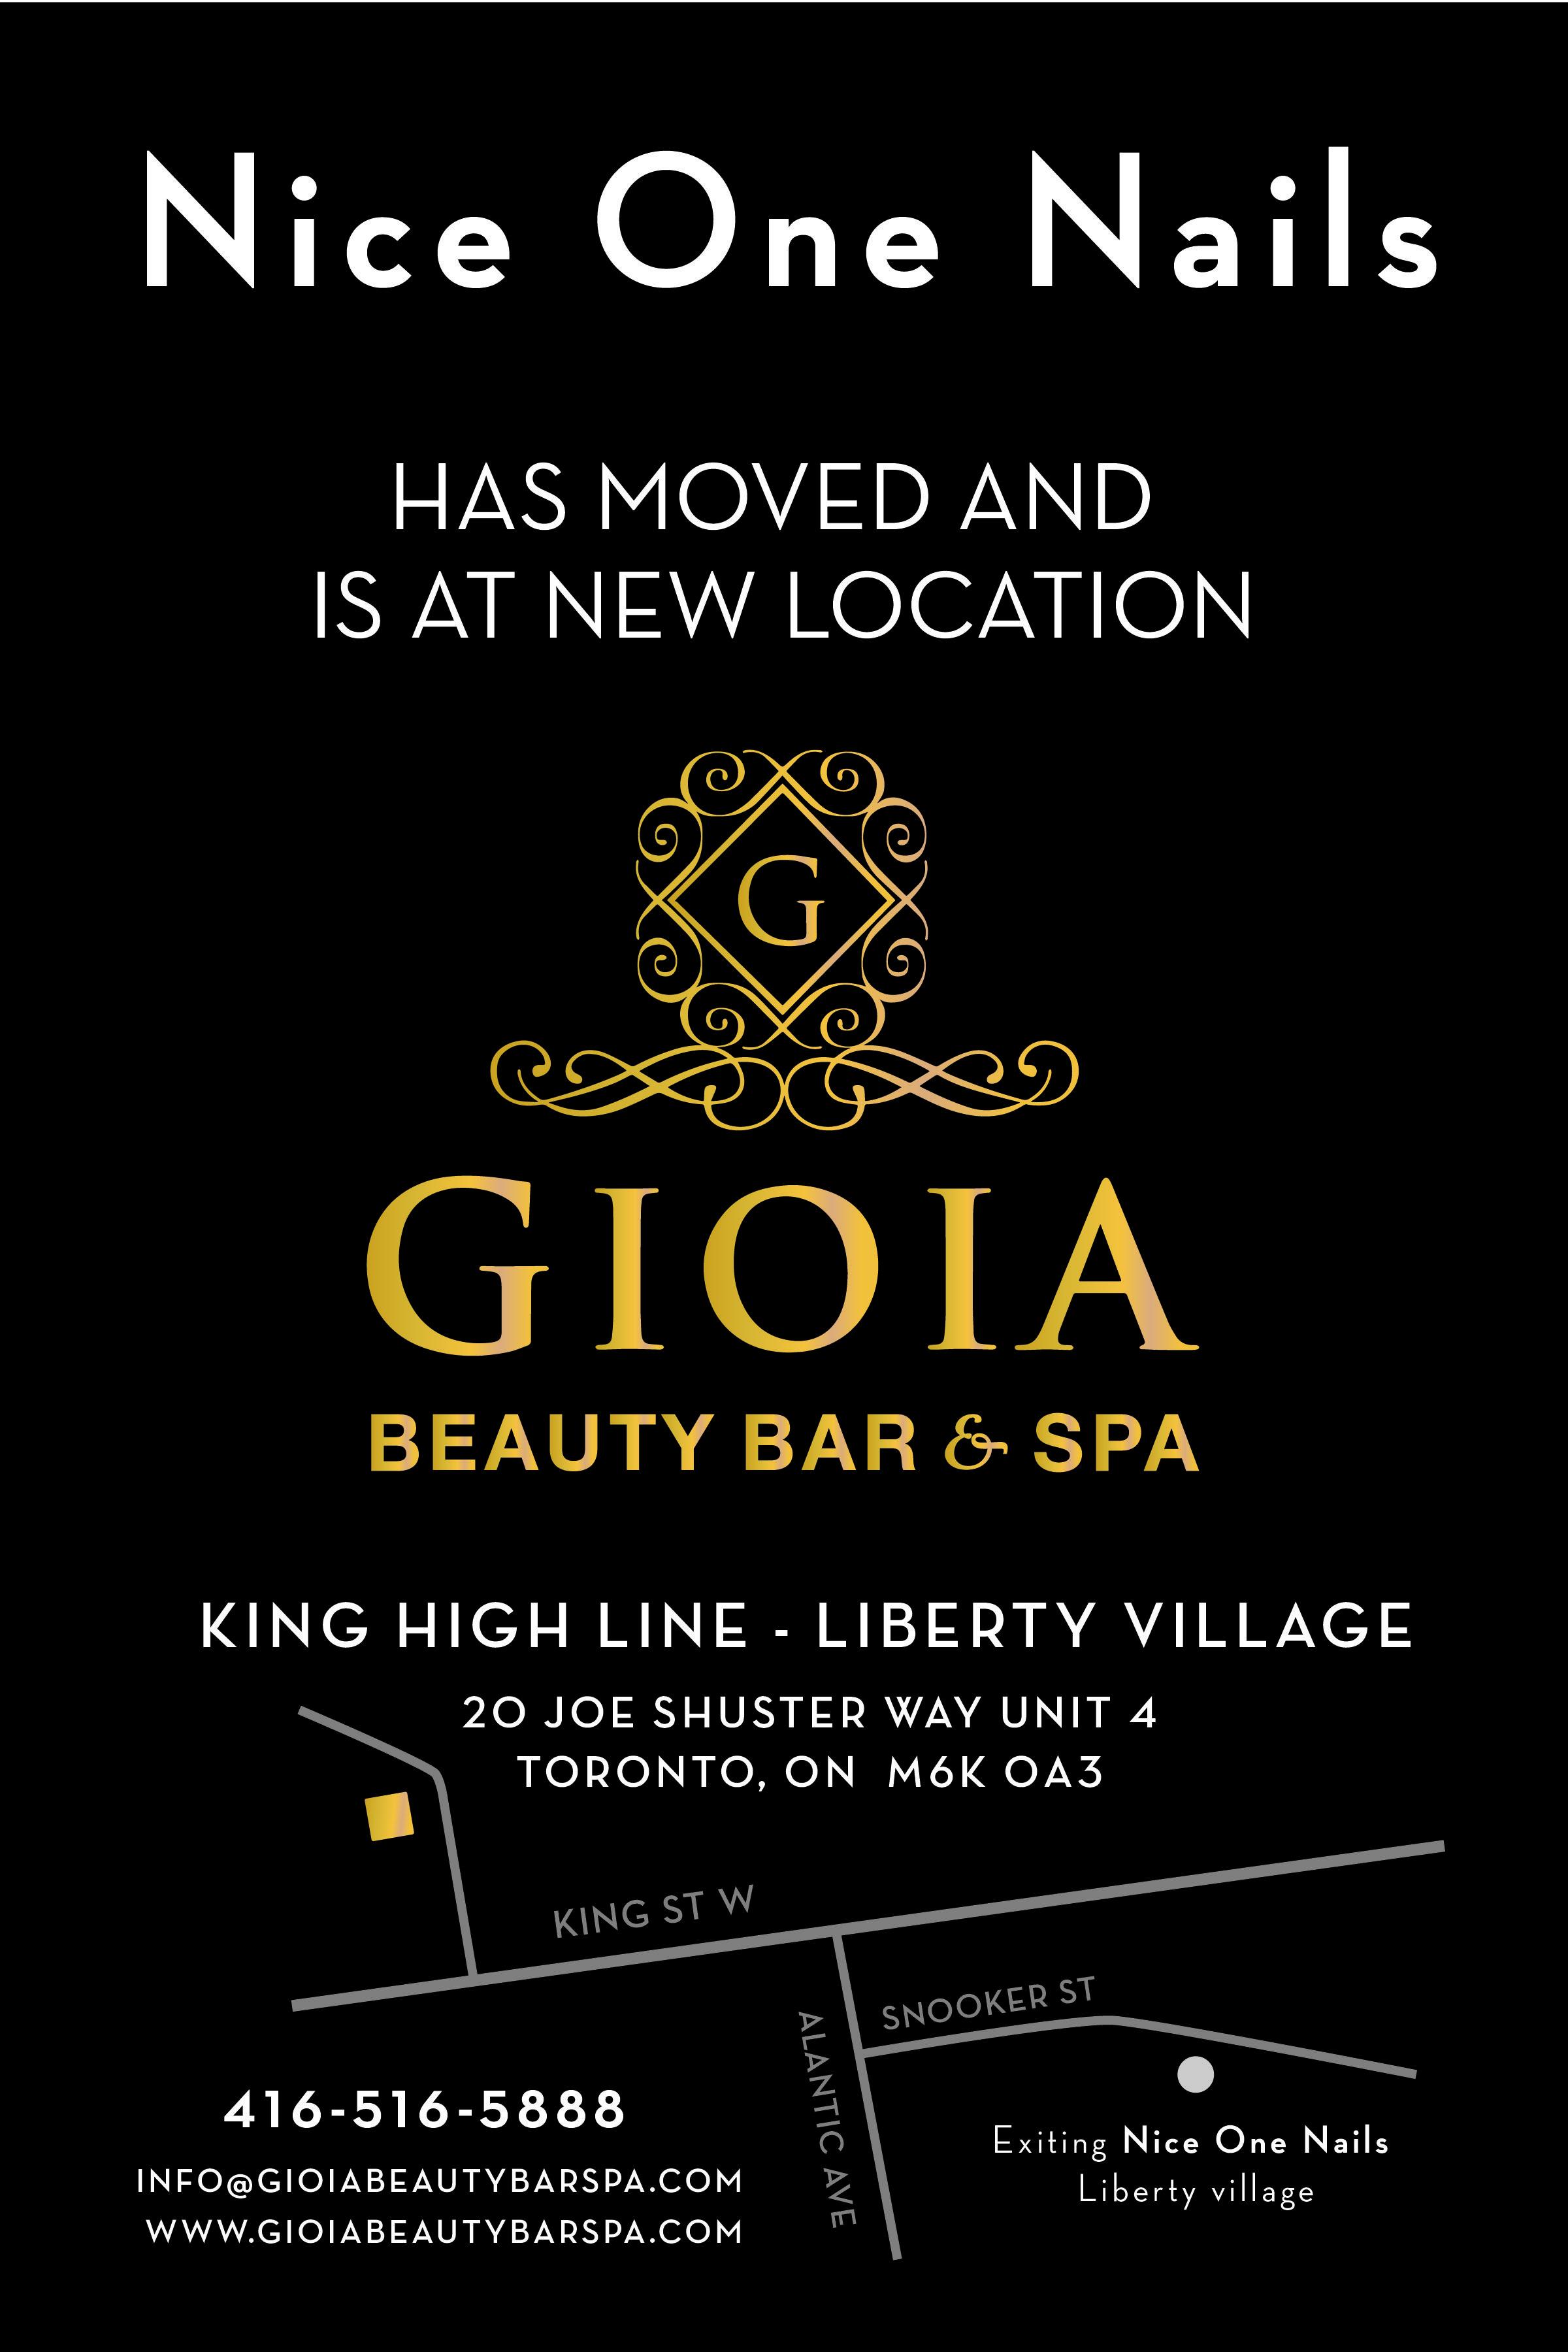 GIOIA Beauty Bar & Spa (gioiaspa0490) on Pinterest